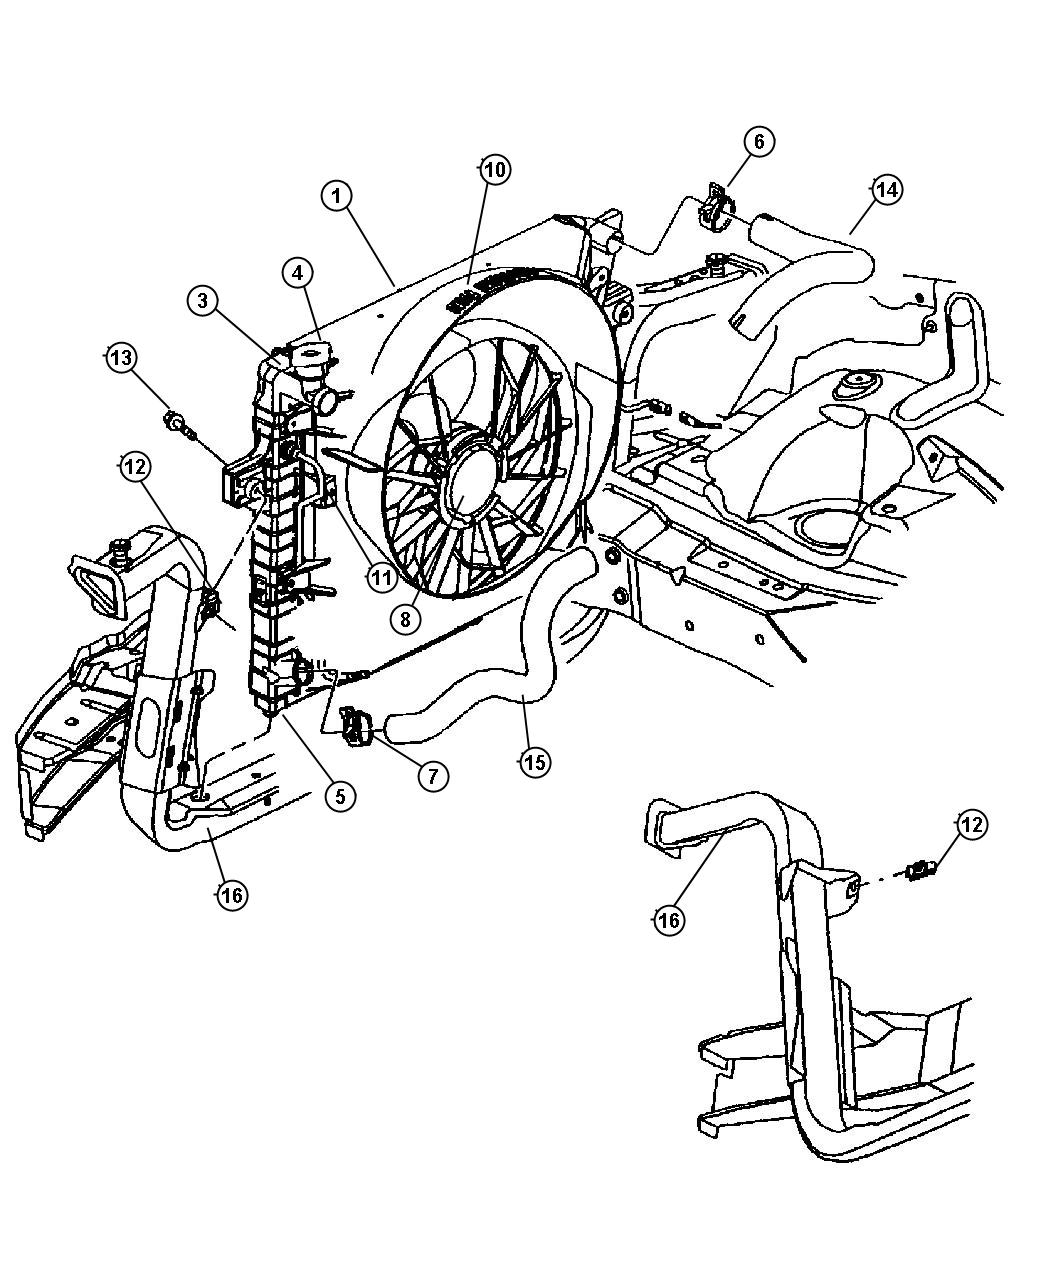 Dodge Durango Radiator Engine Cooling After 2 24